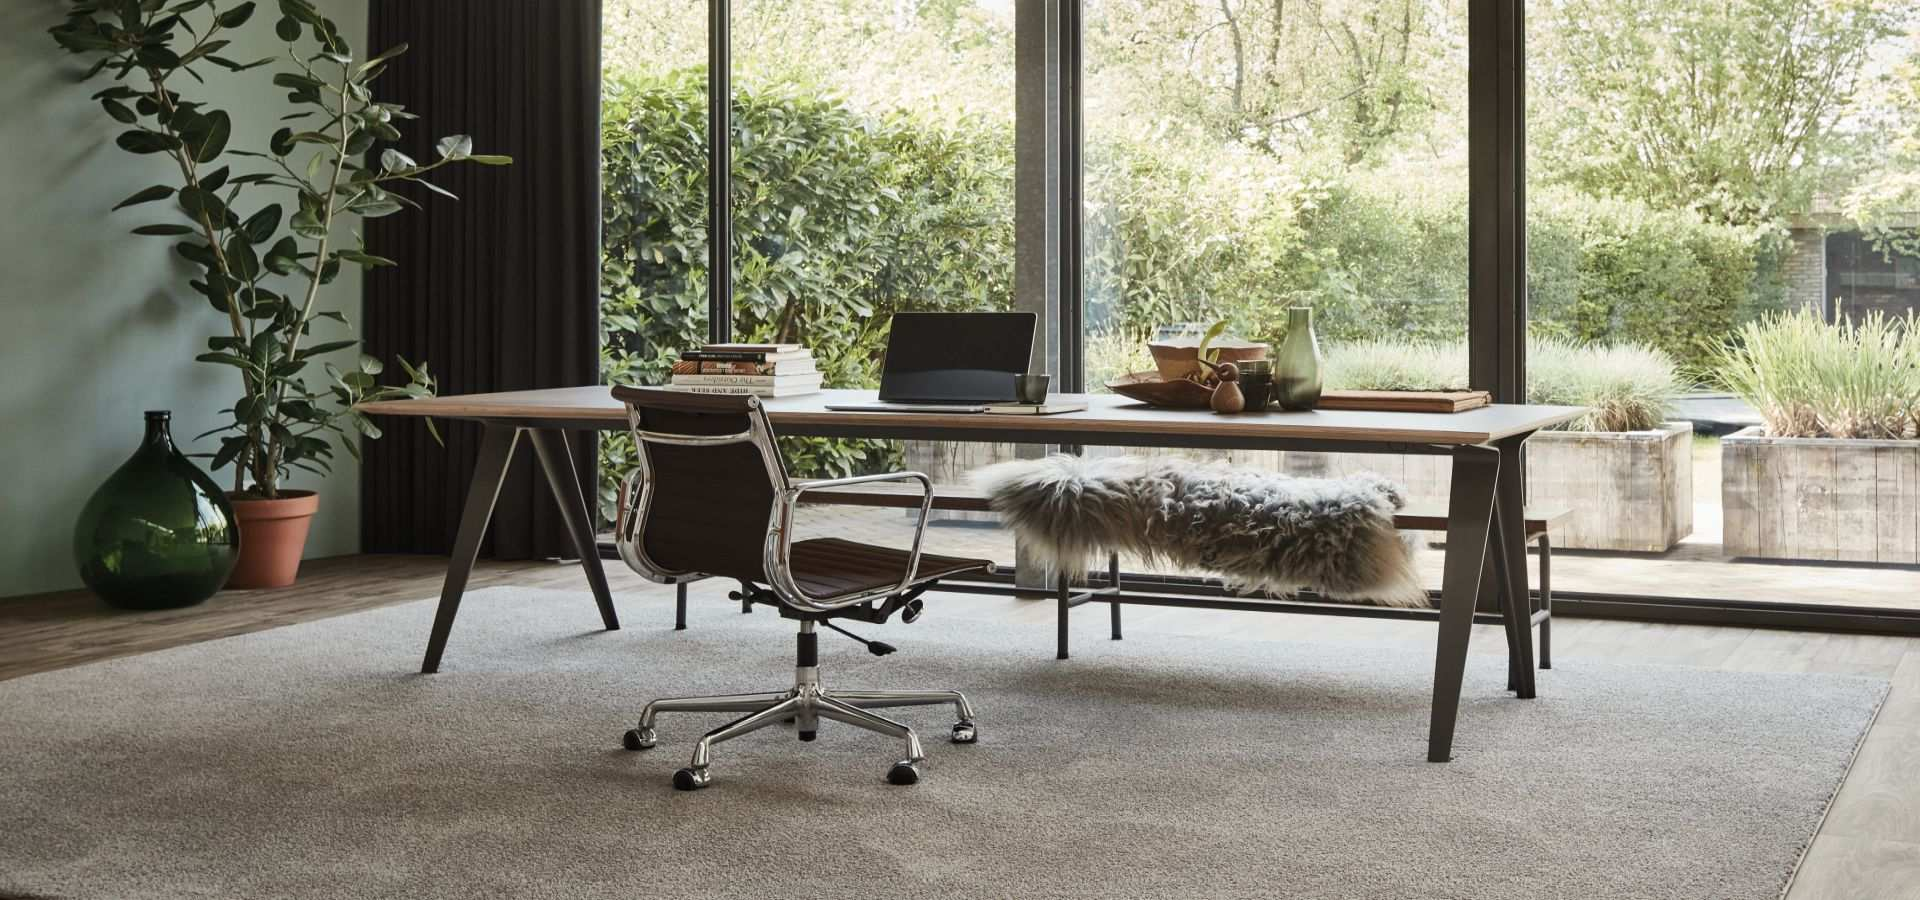 Bild Office Teppichboden Touch grau